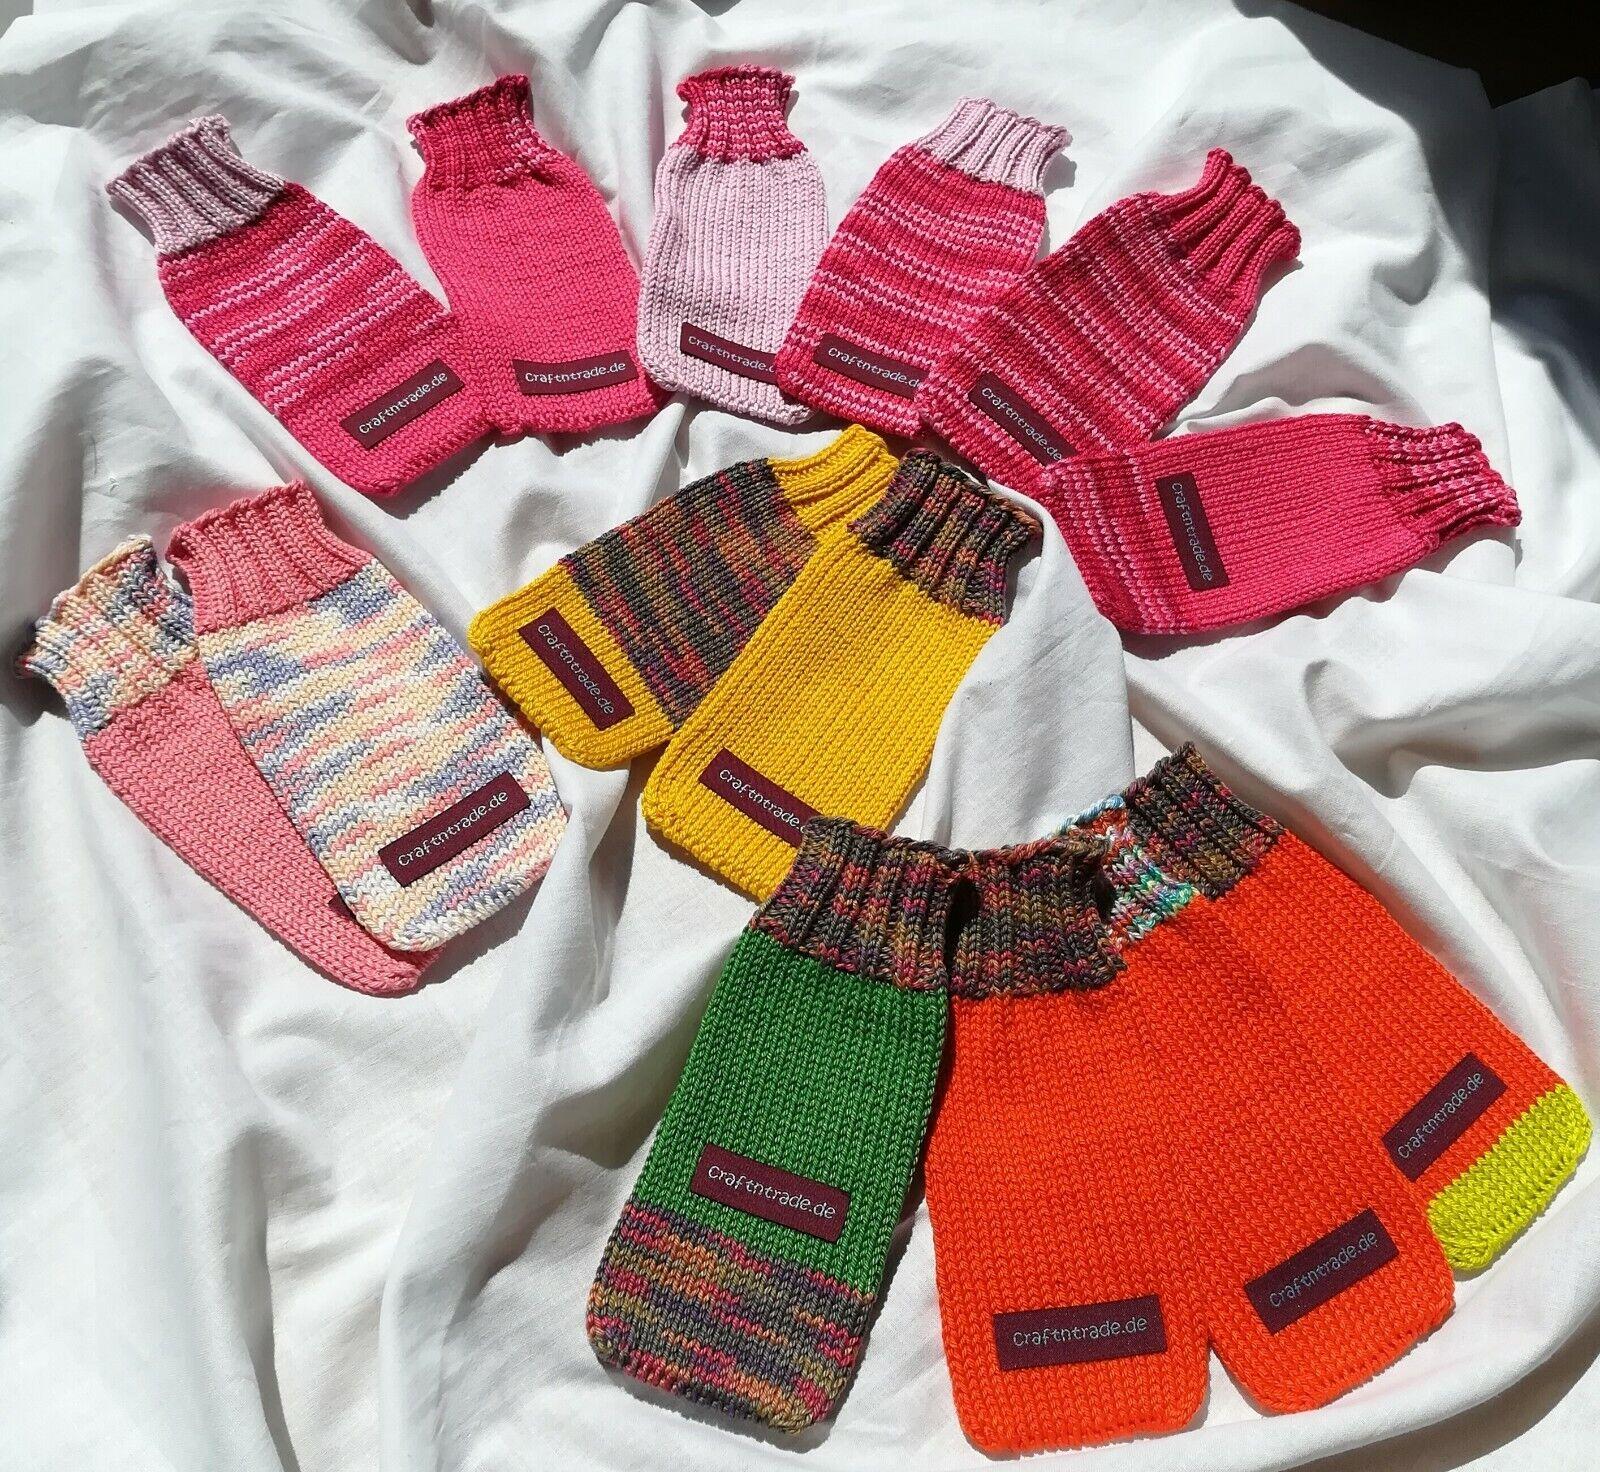 Handyhülle Handytasche Handysocke  ~5,5 Zoll Farbwahl Handarbeit Baumwolle